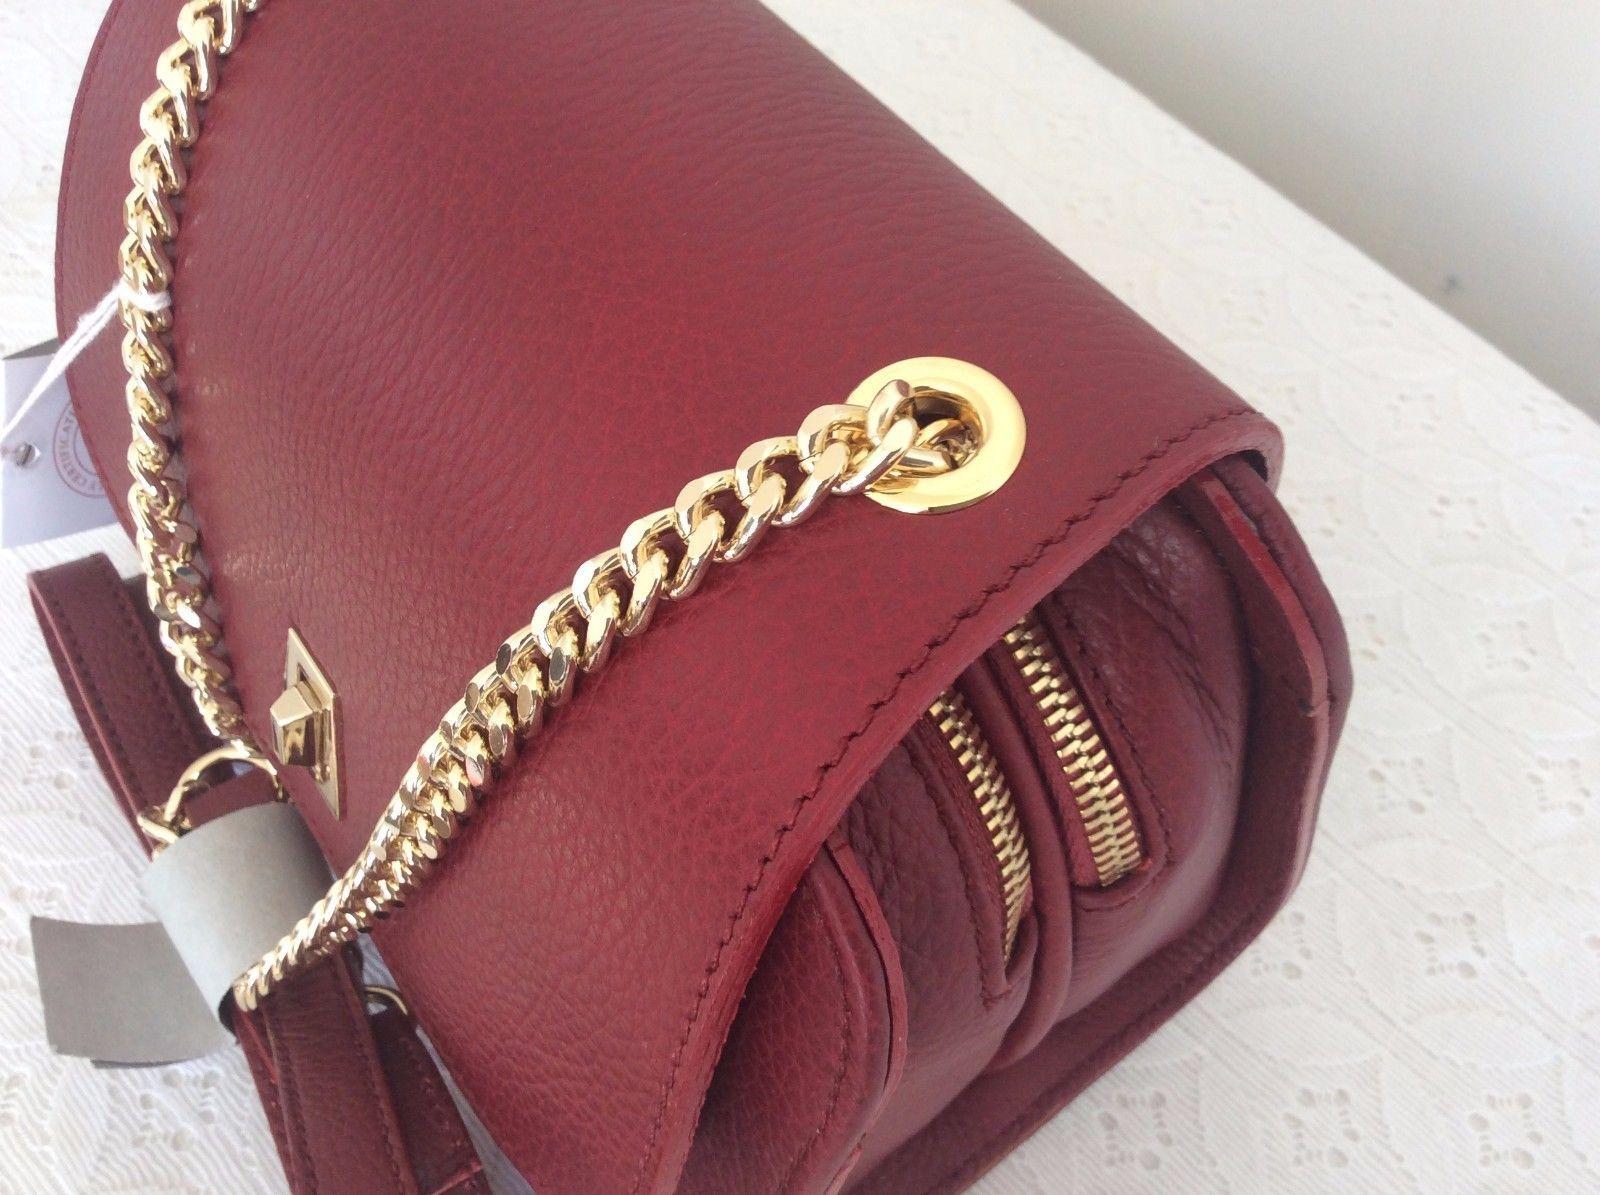 Carbotti Italian Leather Chain Clutch  Bag/Purse  Classic Timeless Fashion